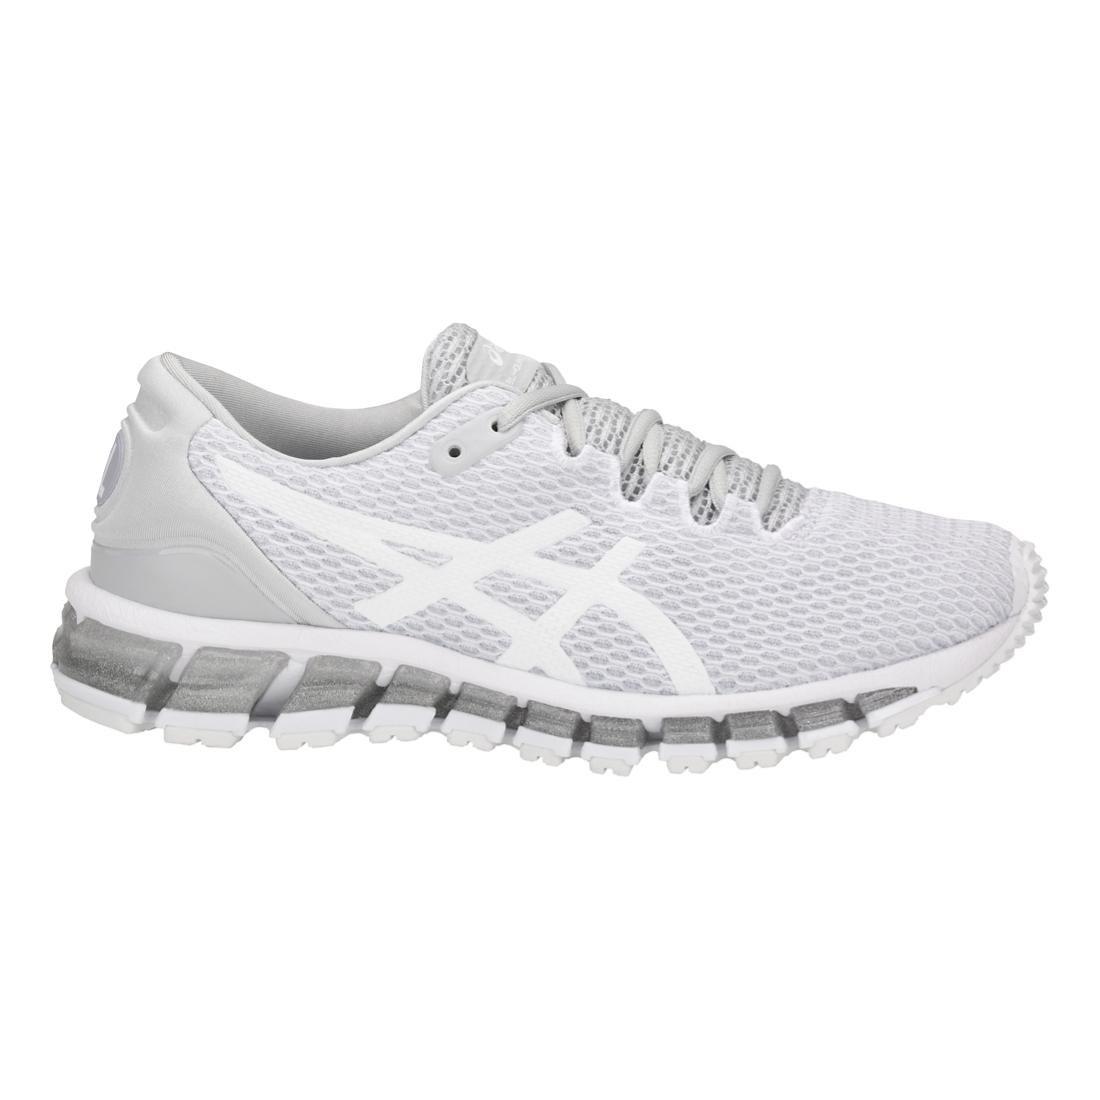 ASICS T889N Women's Gel-Quantum 360 Shift MX B(M) Running Shoe B0714DC4C9 6.5 B(M) MX US|White/Glacier Grey/White ac02fd